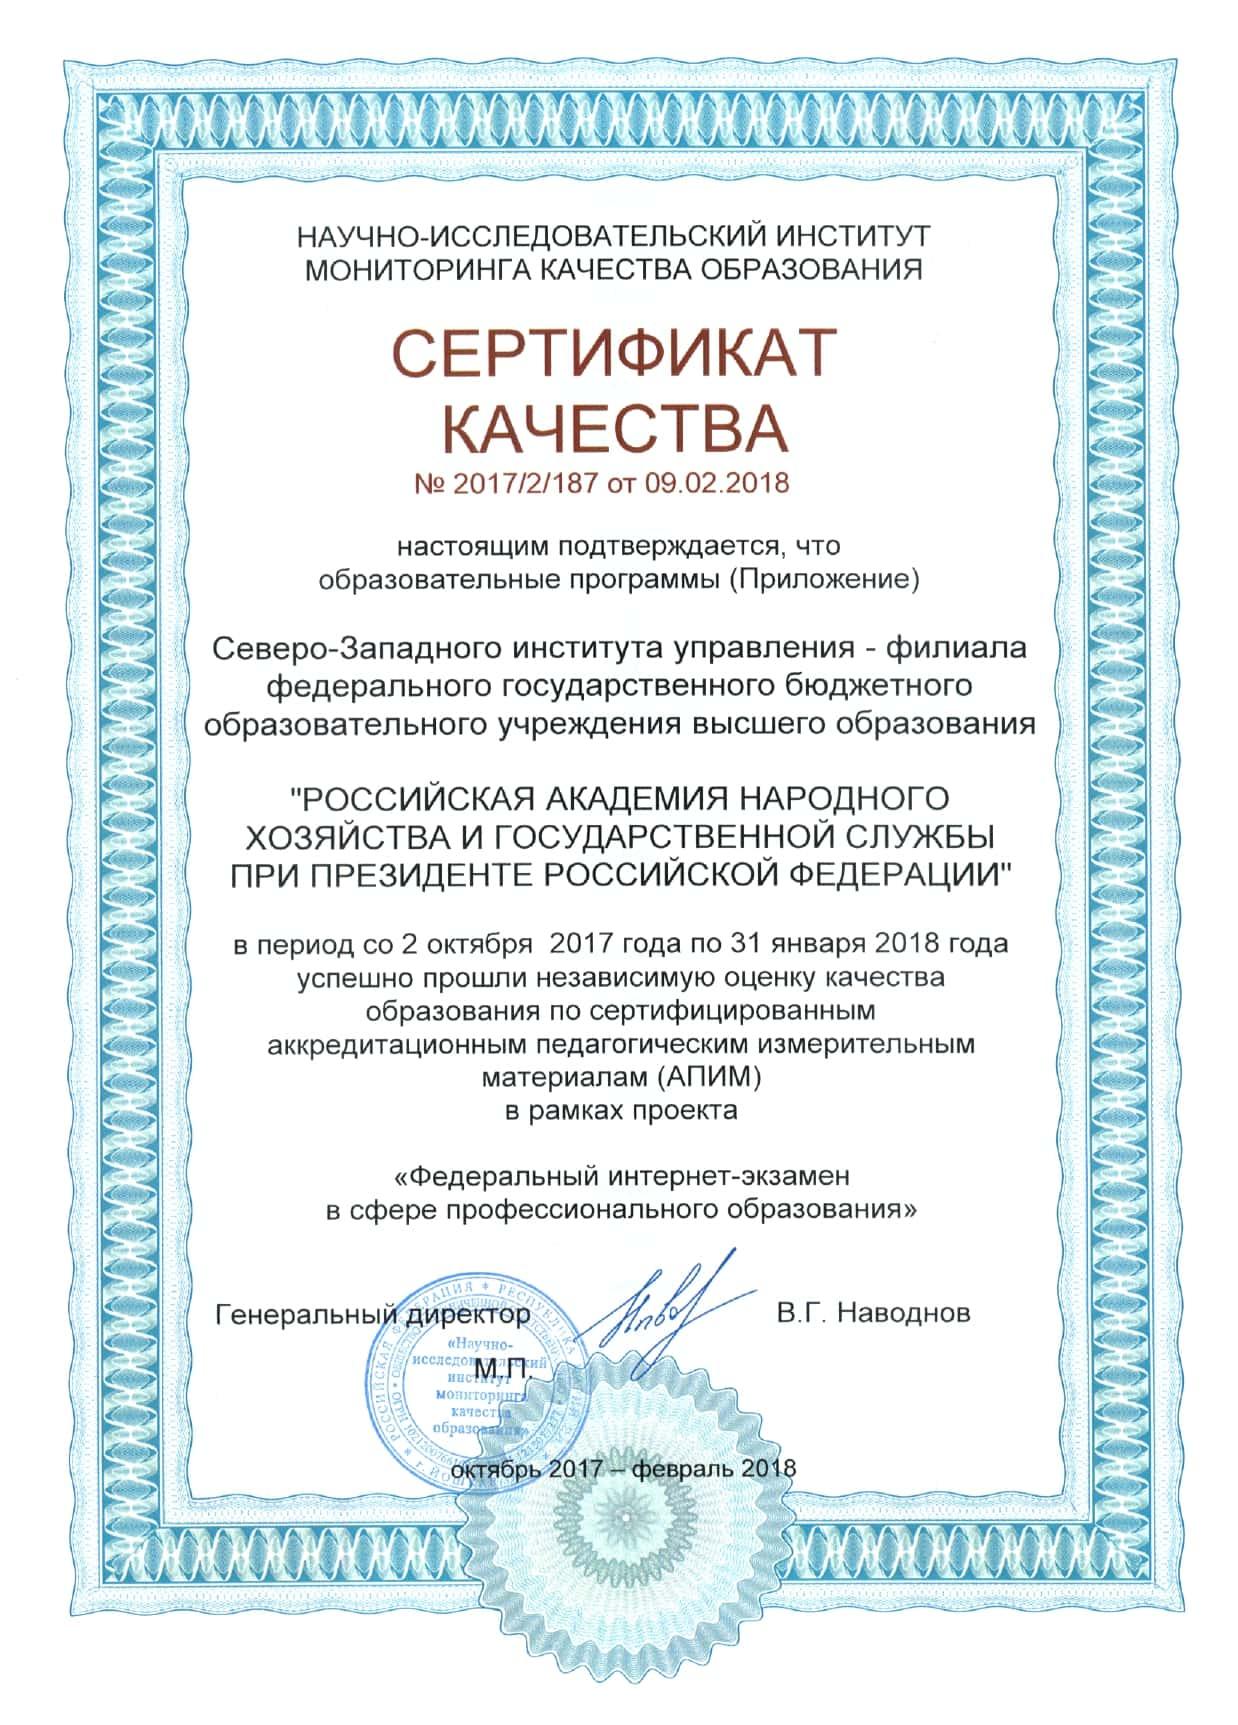 sertificat kachestva 2017 2